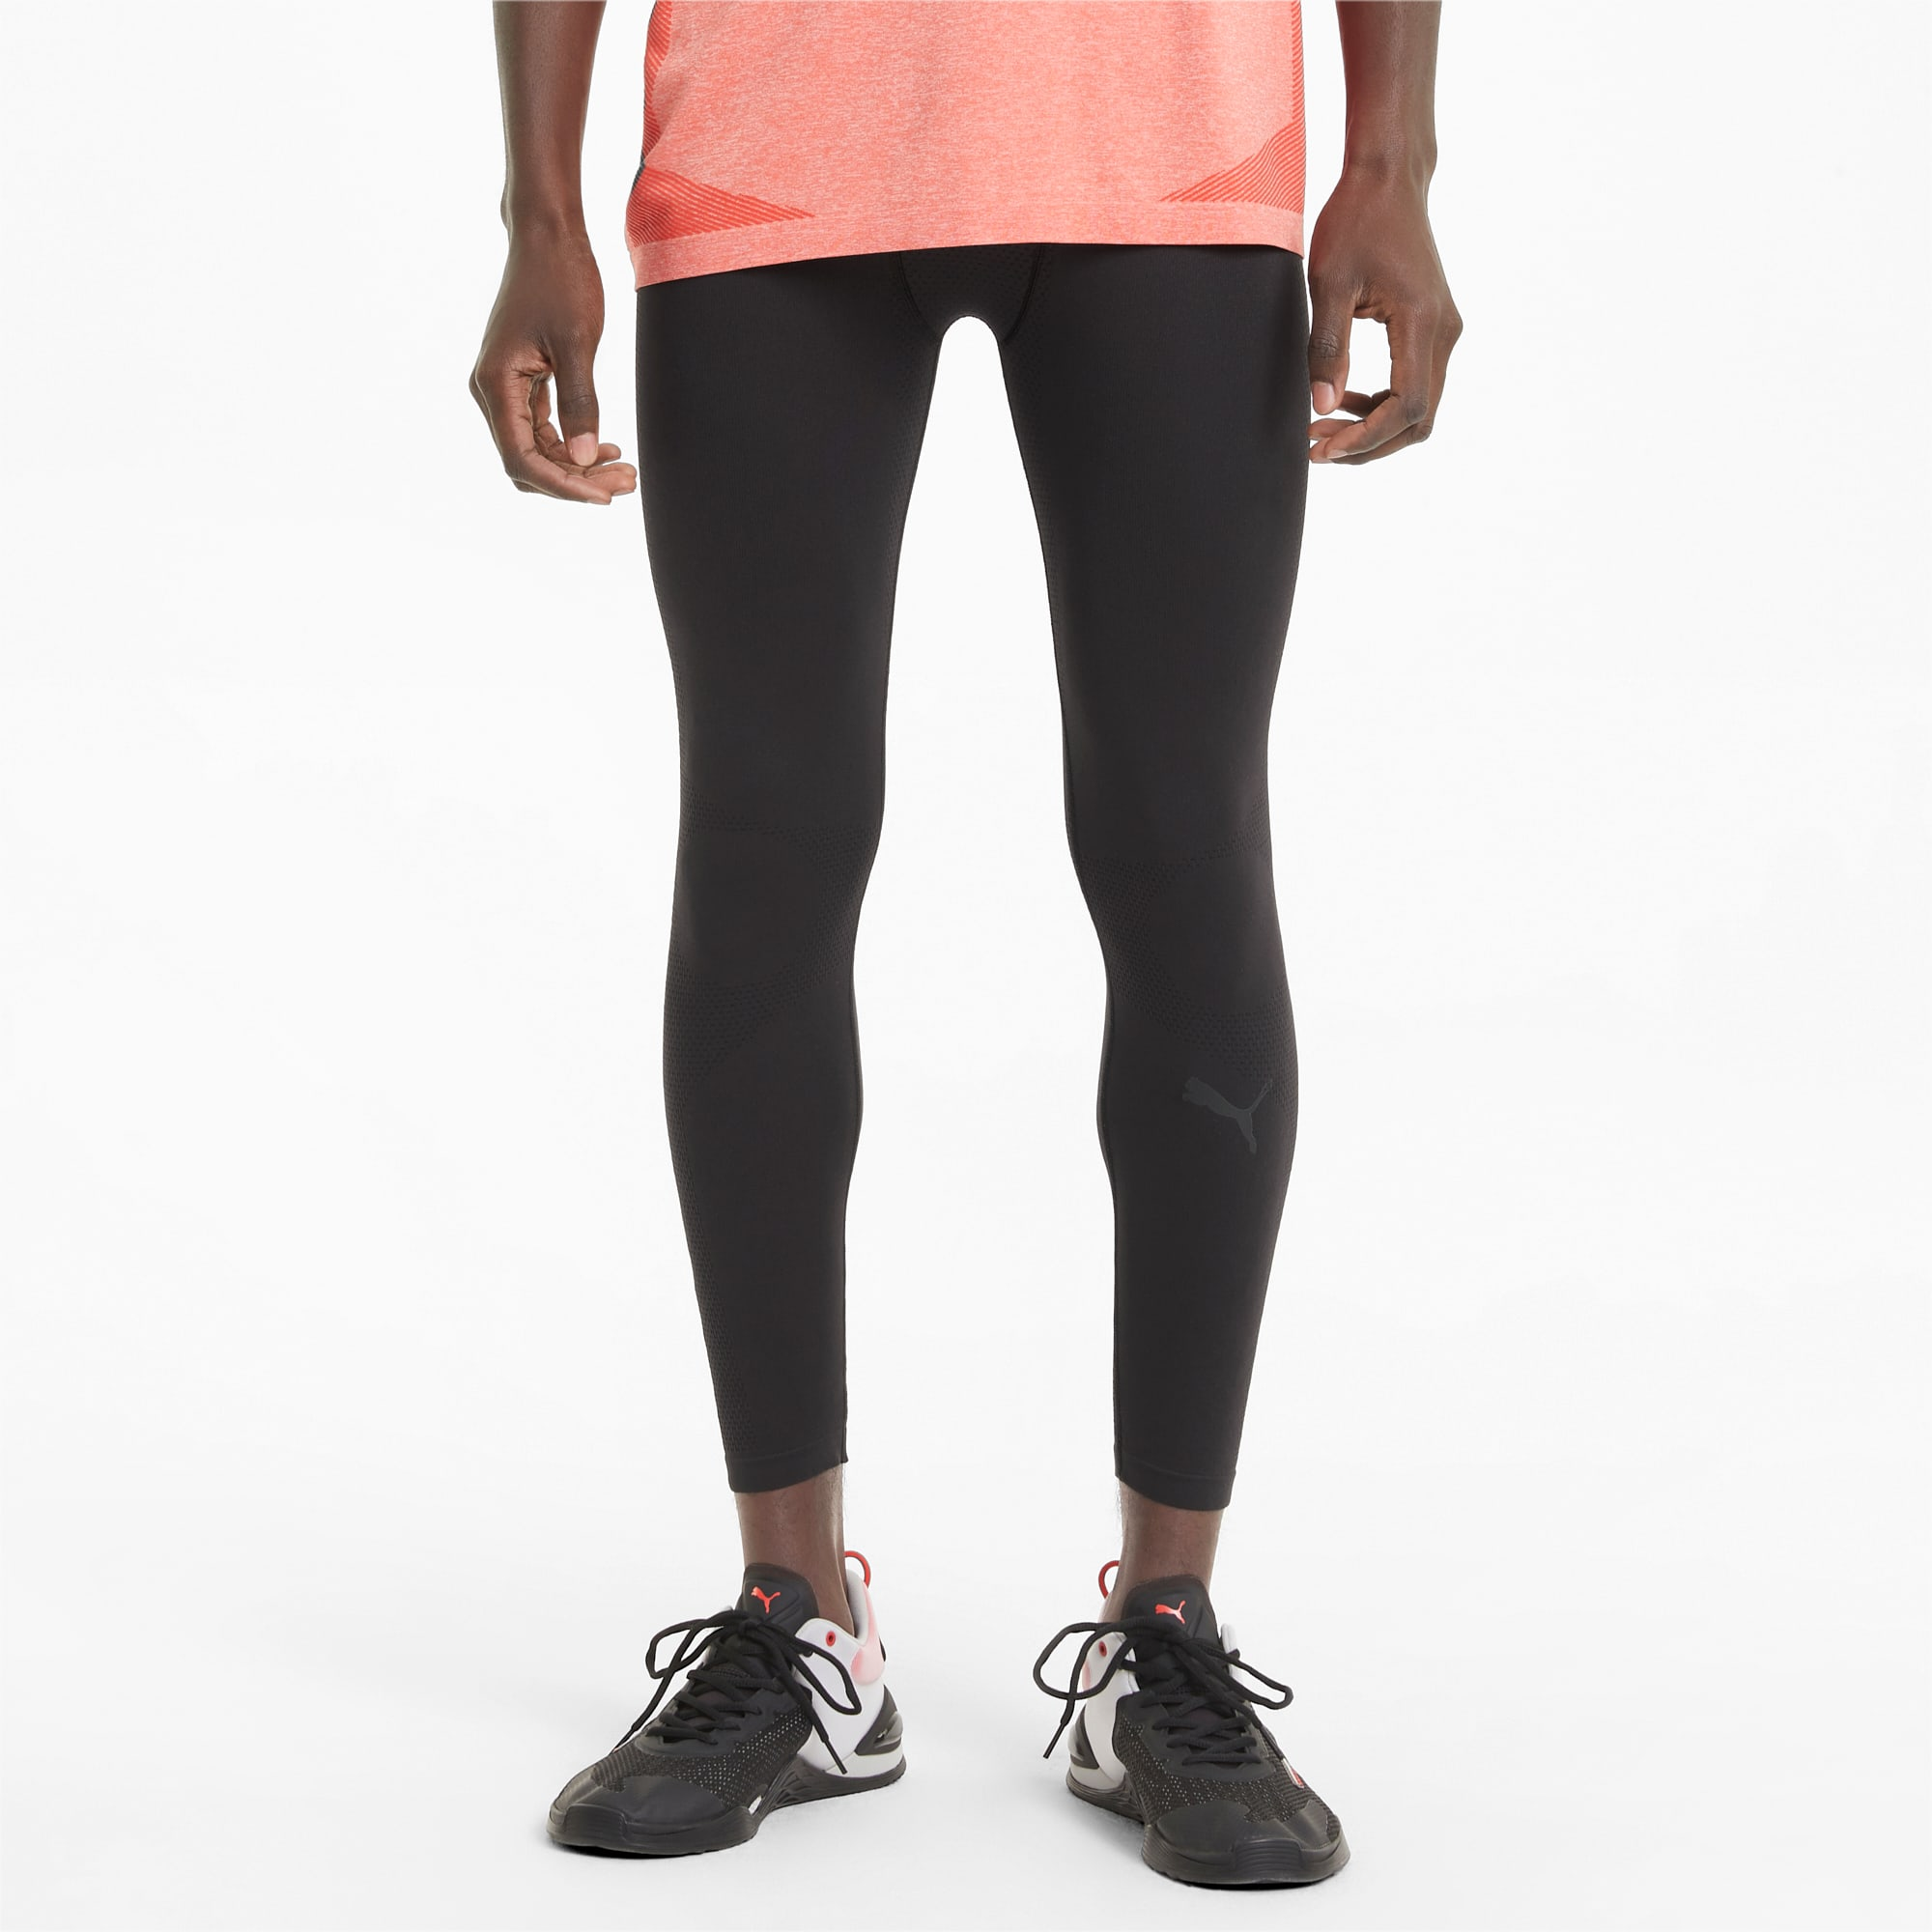 Seamless Bodywear Men's Long Training Tights